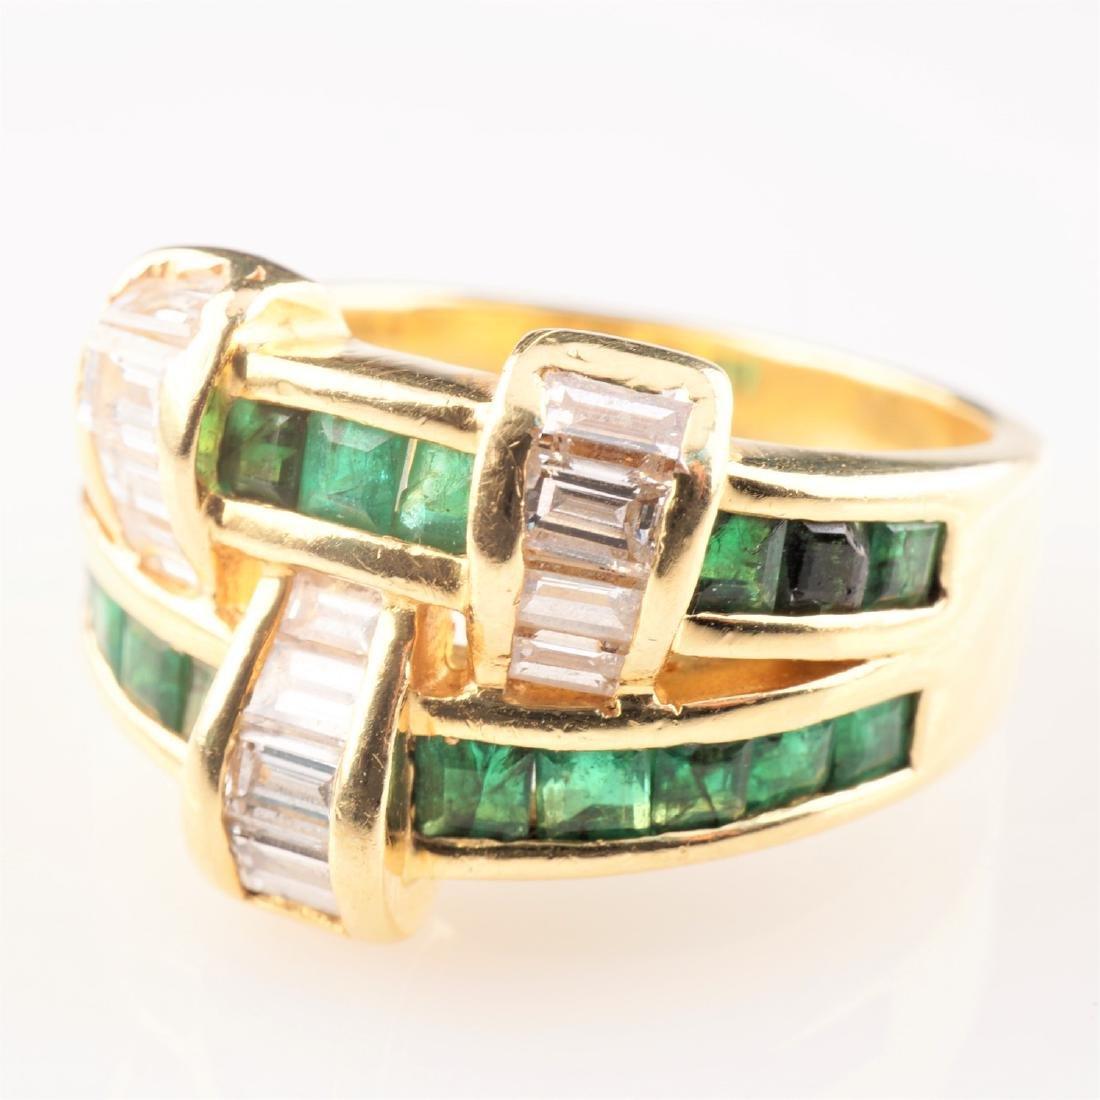 18k YG Emerald and Diamond Ring sz 6.75